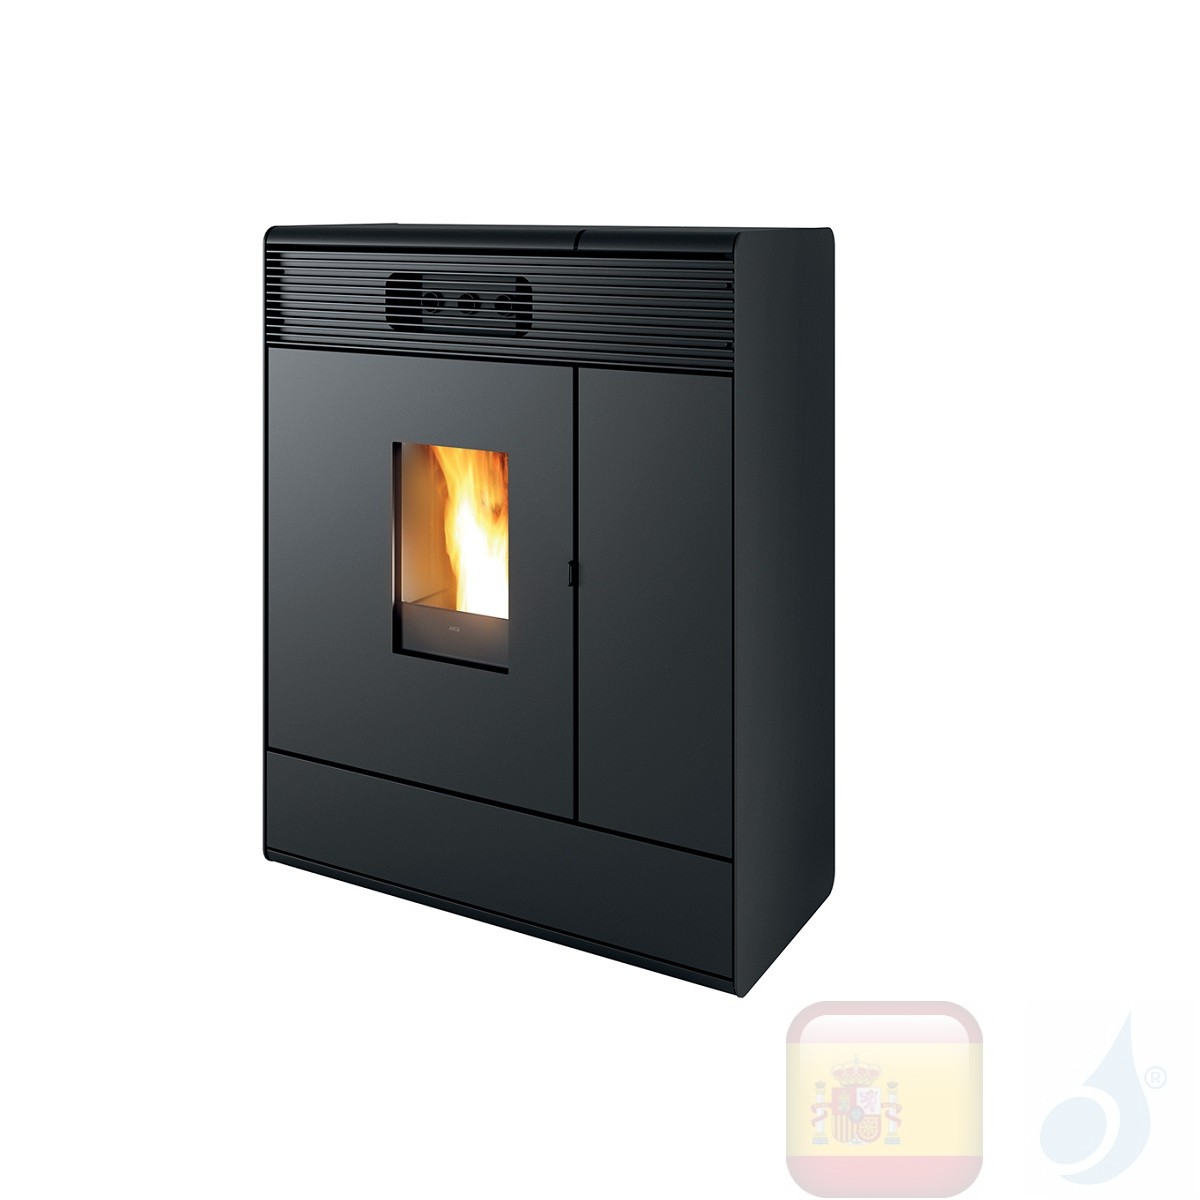 Estufa termo de pellets MCZ 16.1 kW Aki Hydromatic 16 M1 metal Negro